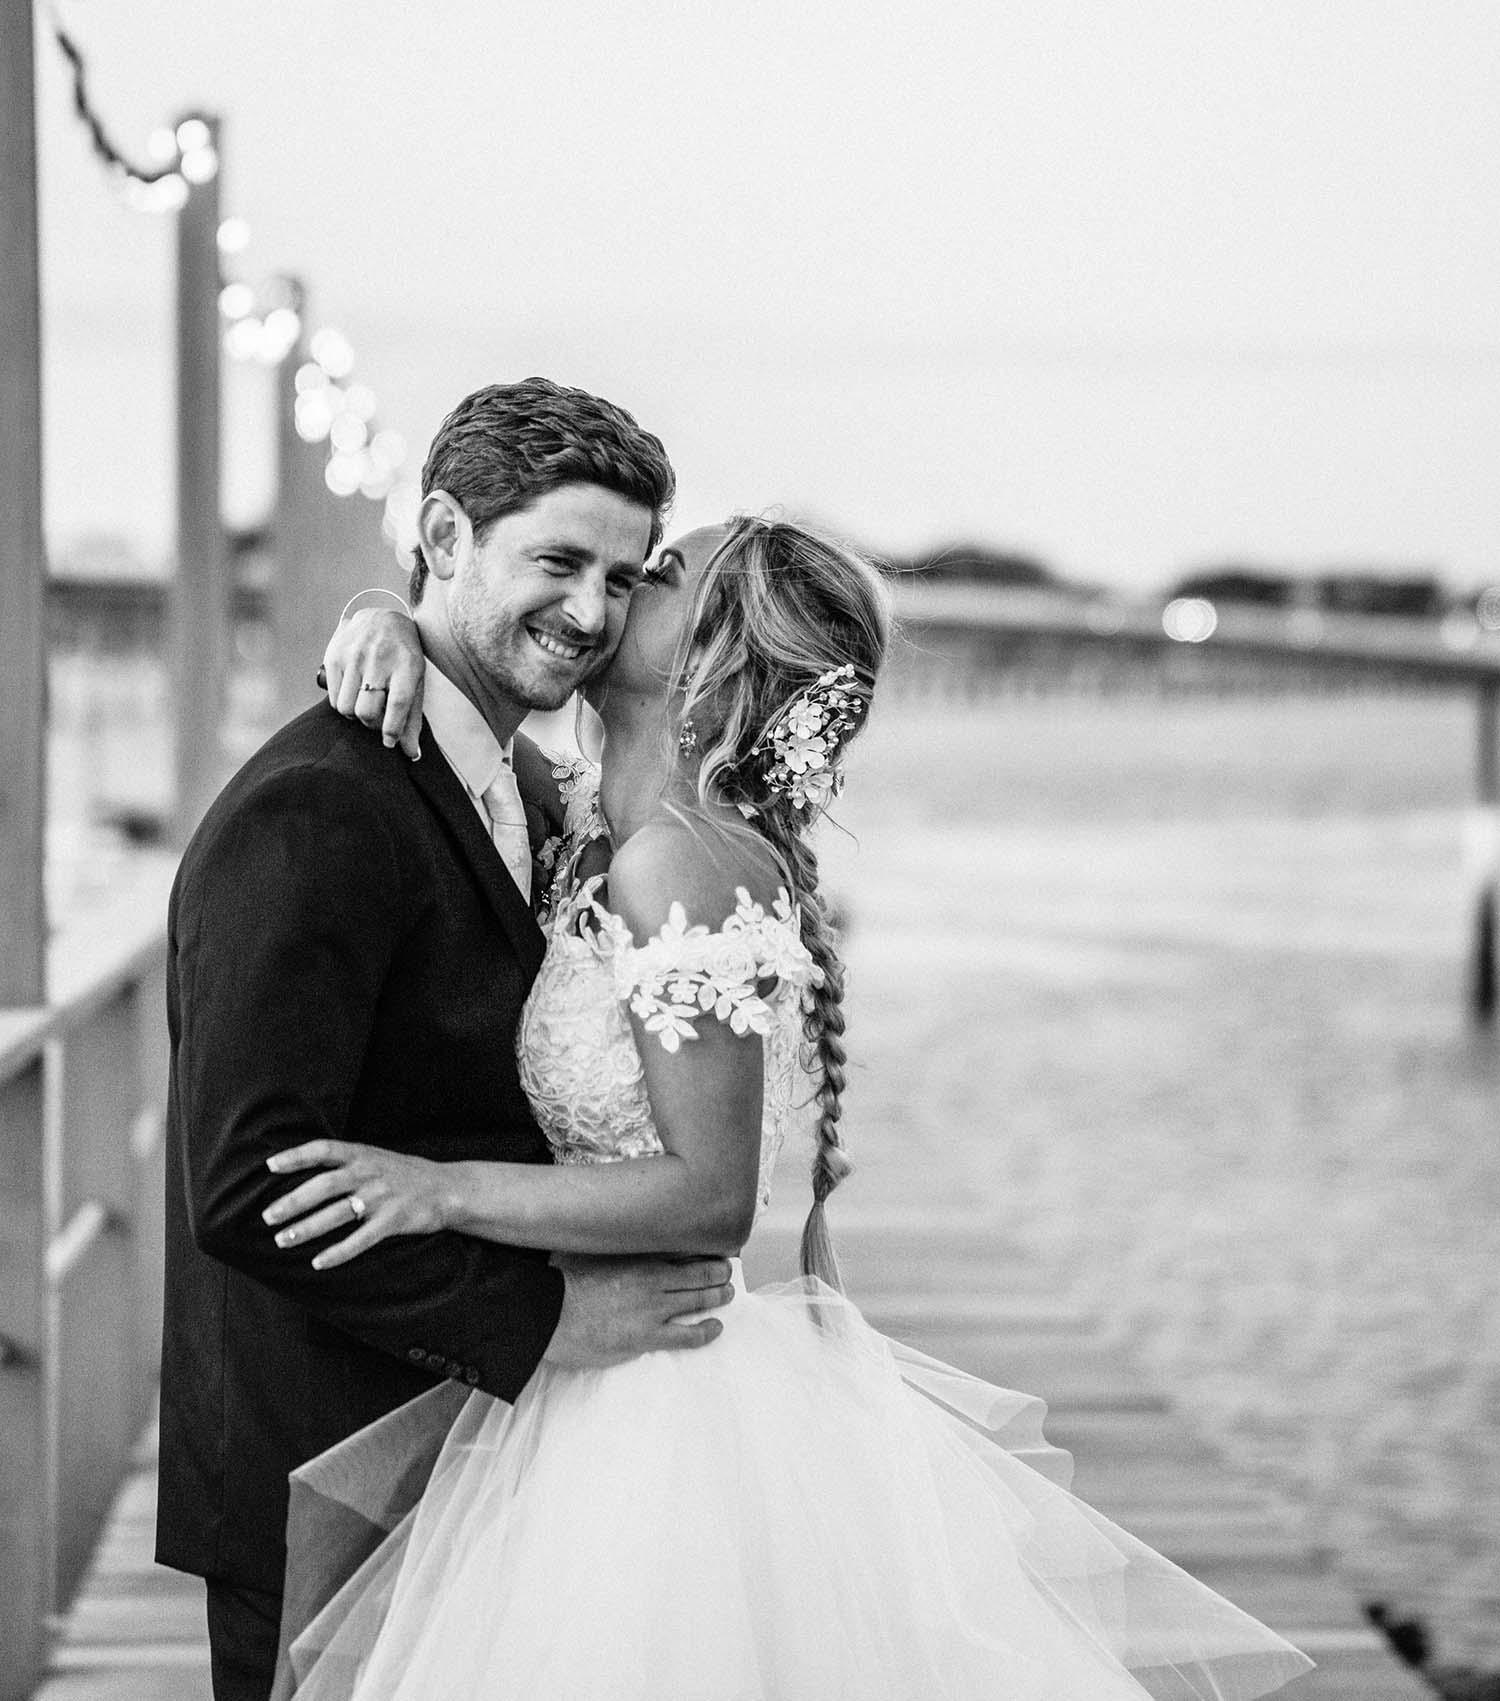 Wedding Photography - Black & White